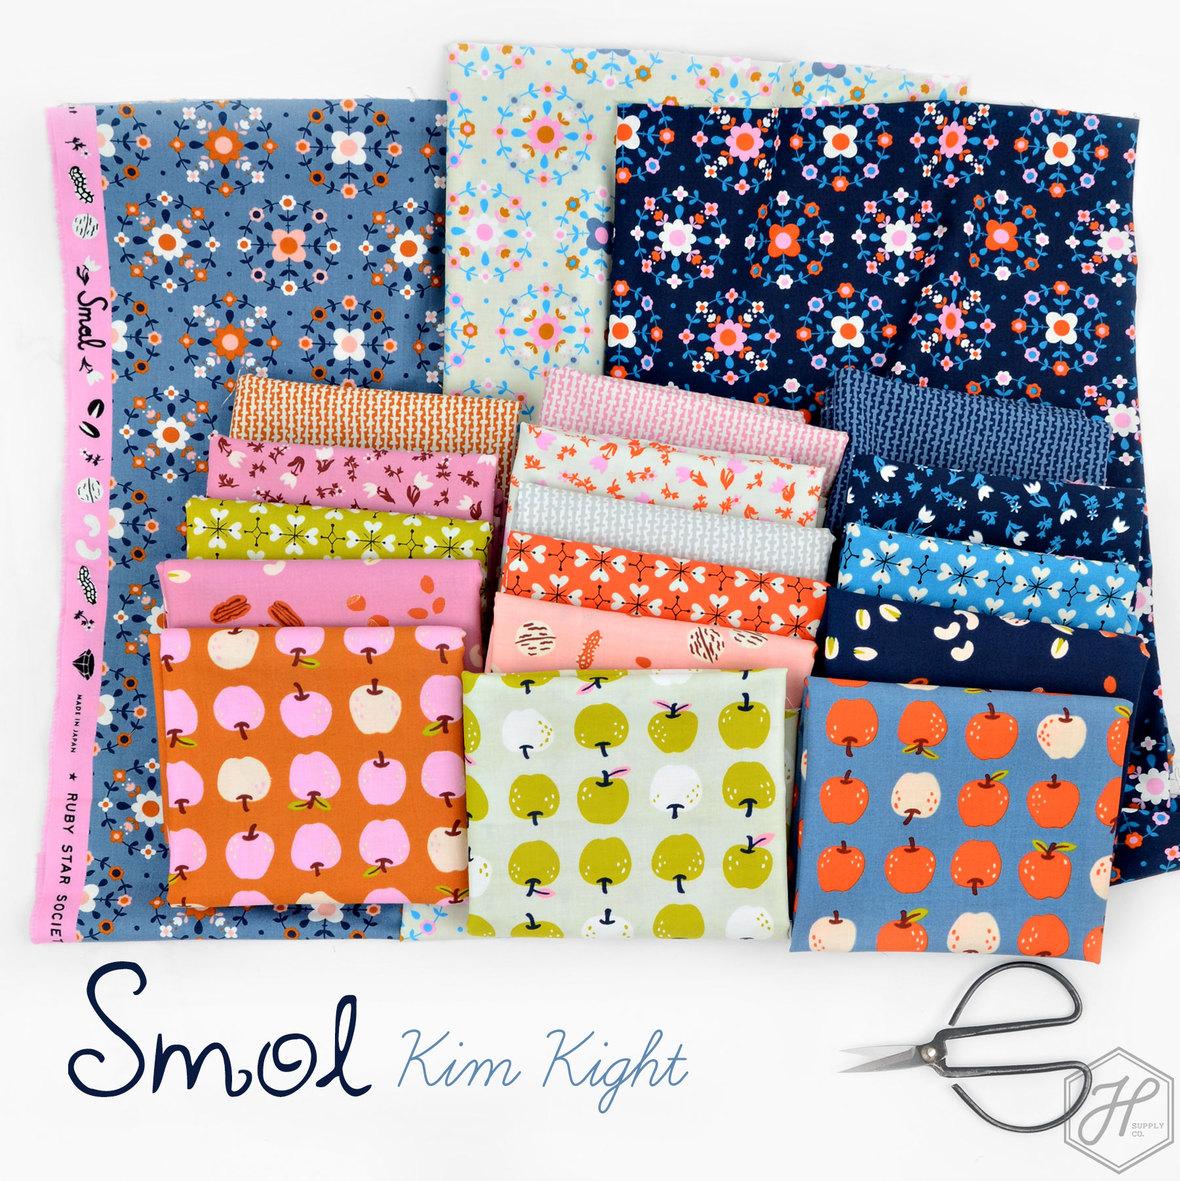 Smol-Fabric-Kim-Kight-for-Hawthorne-Supply-Co-Ruby-Star-Society